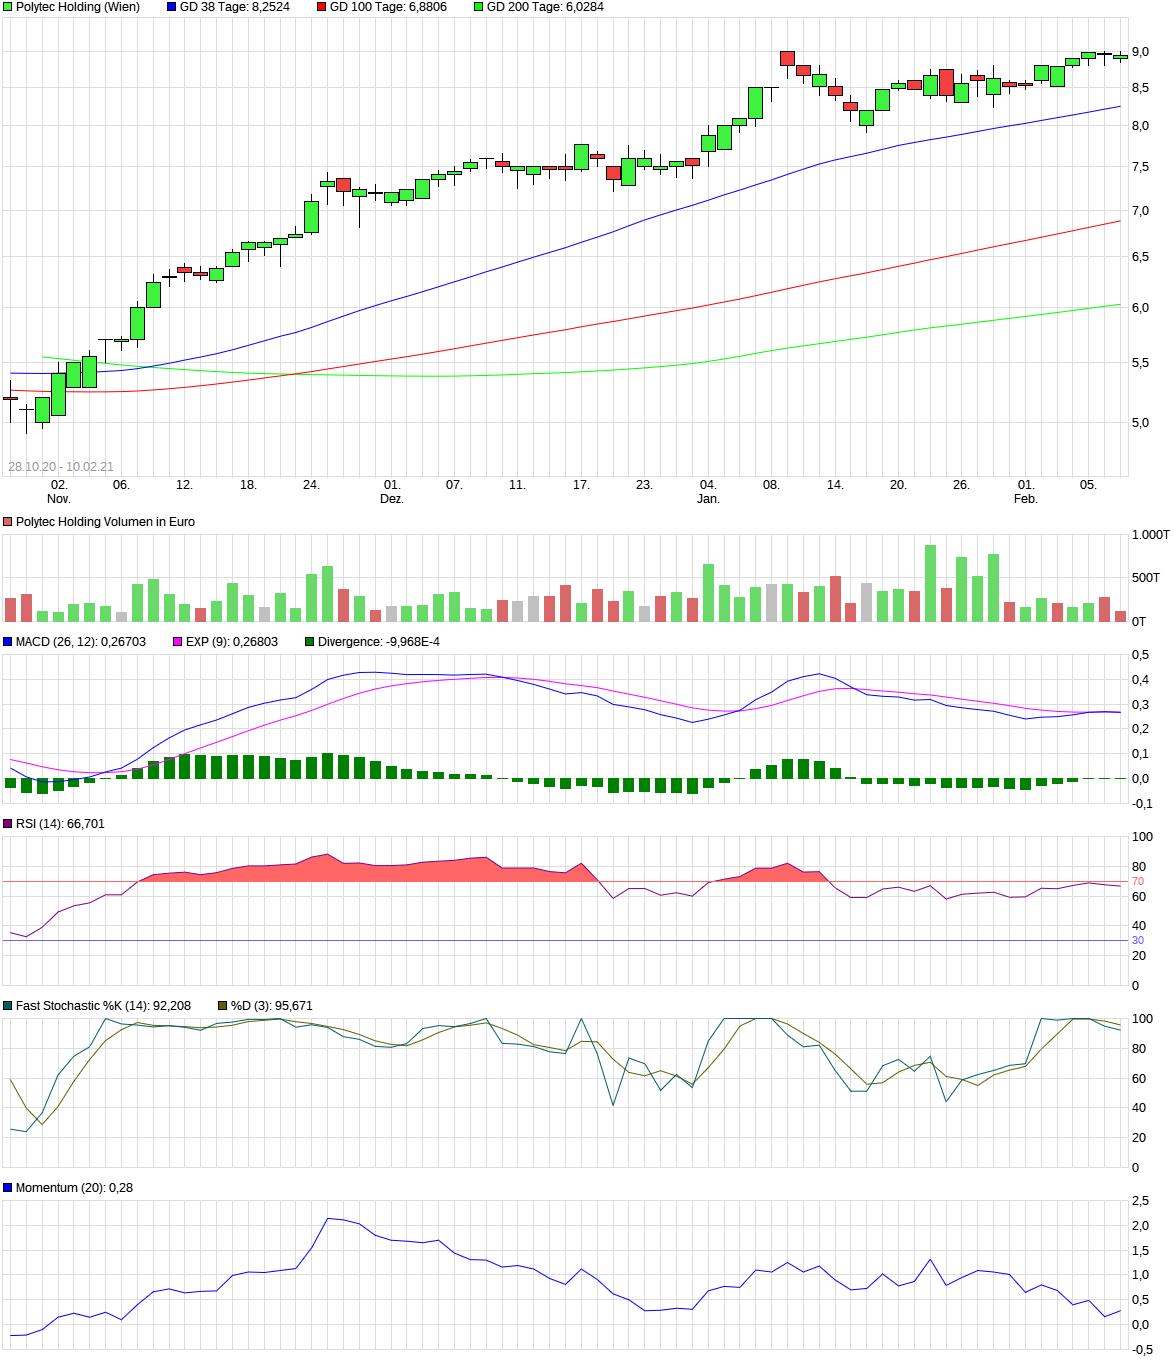 chart_free_polytecholding.png